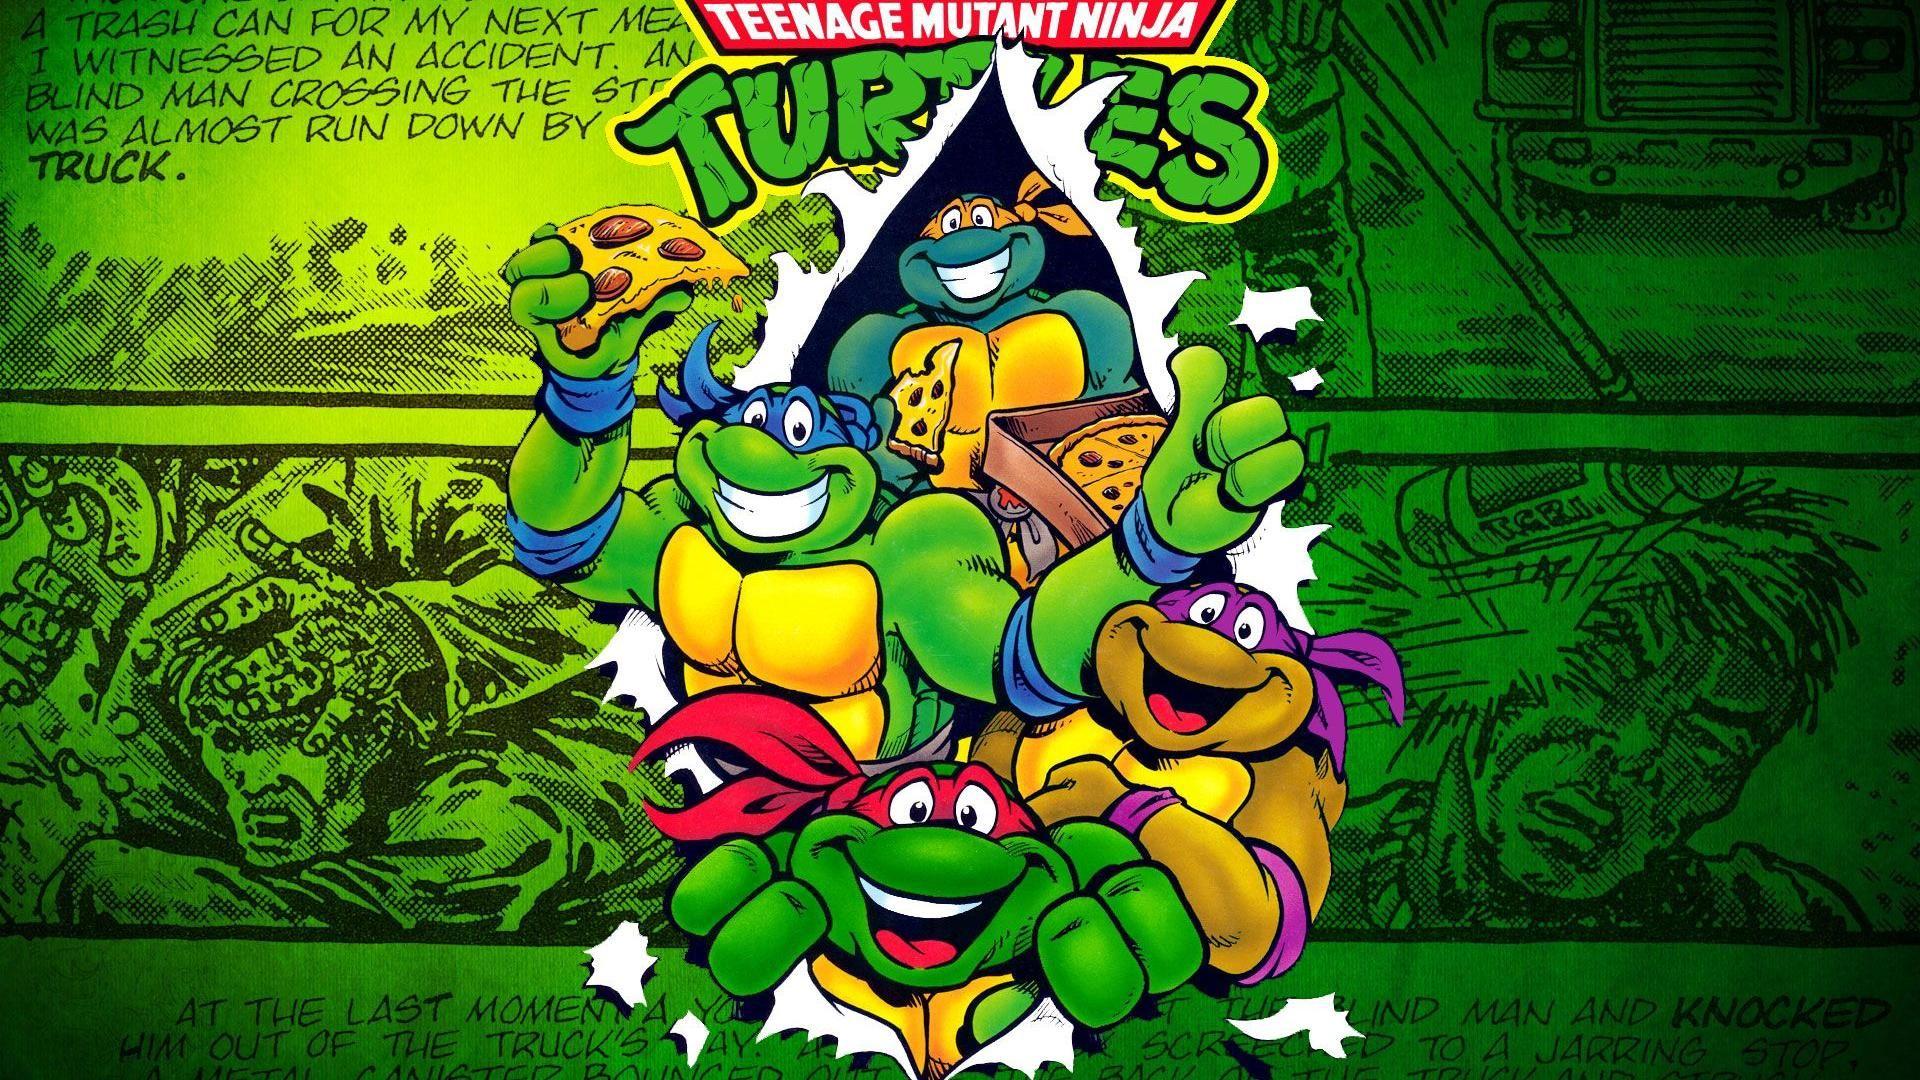 Ninja turtle wallpaper